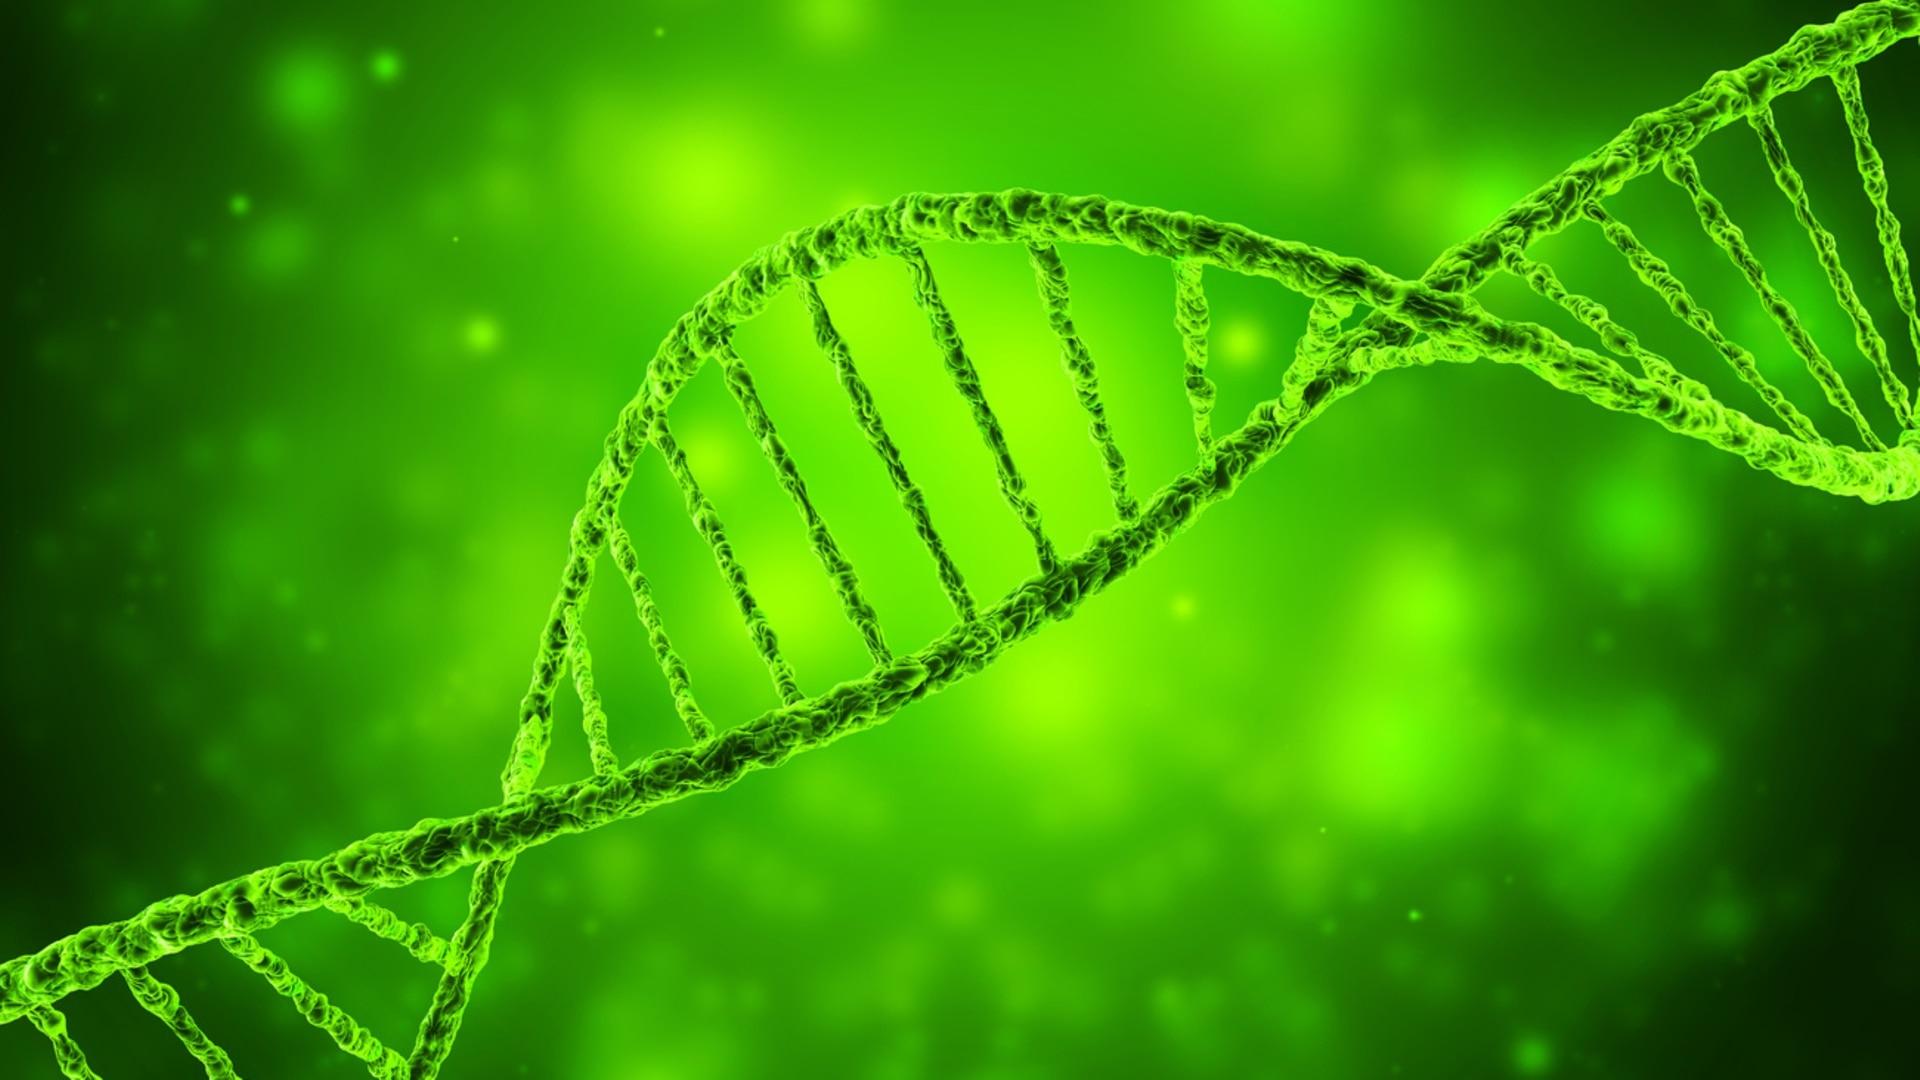 Zurich professors win European inventor prize for DNA encoding work